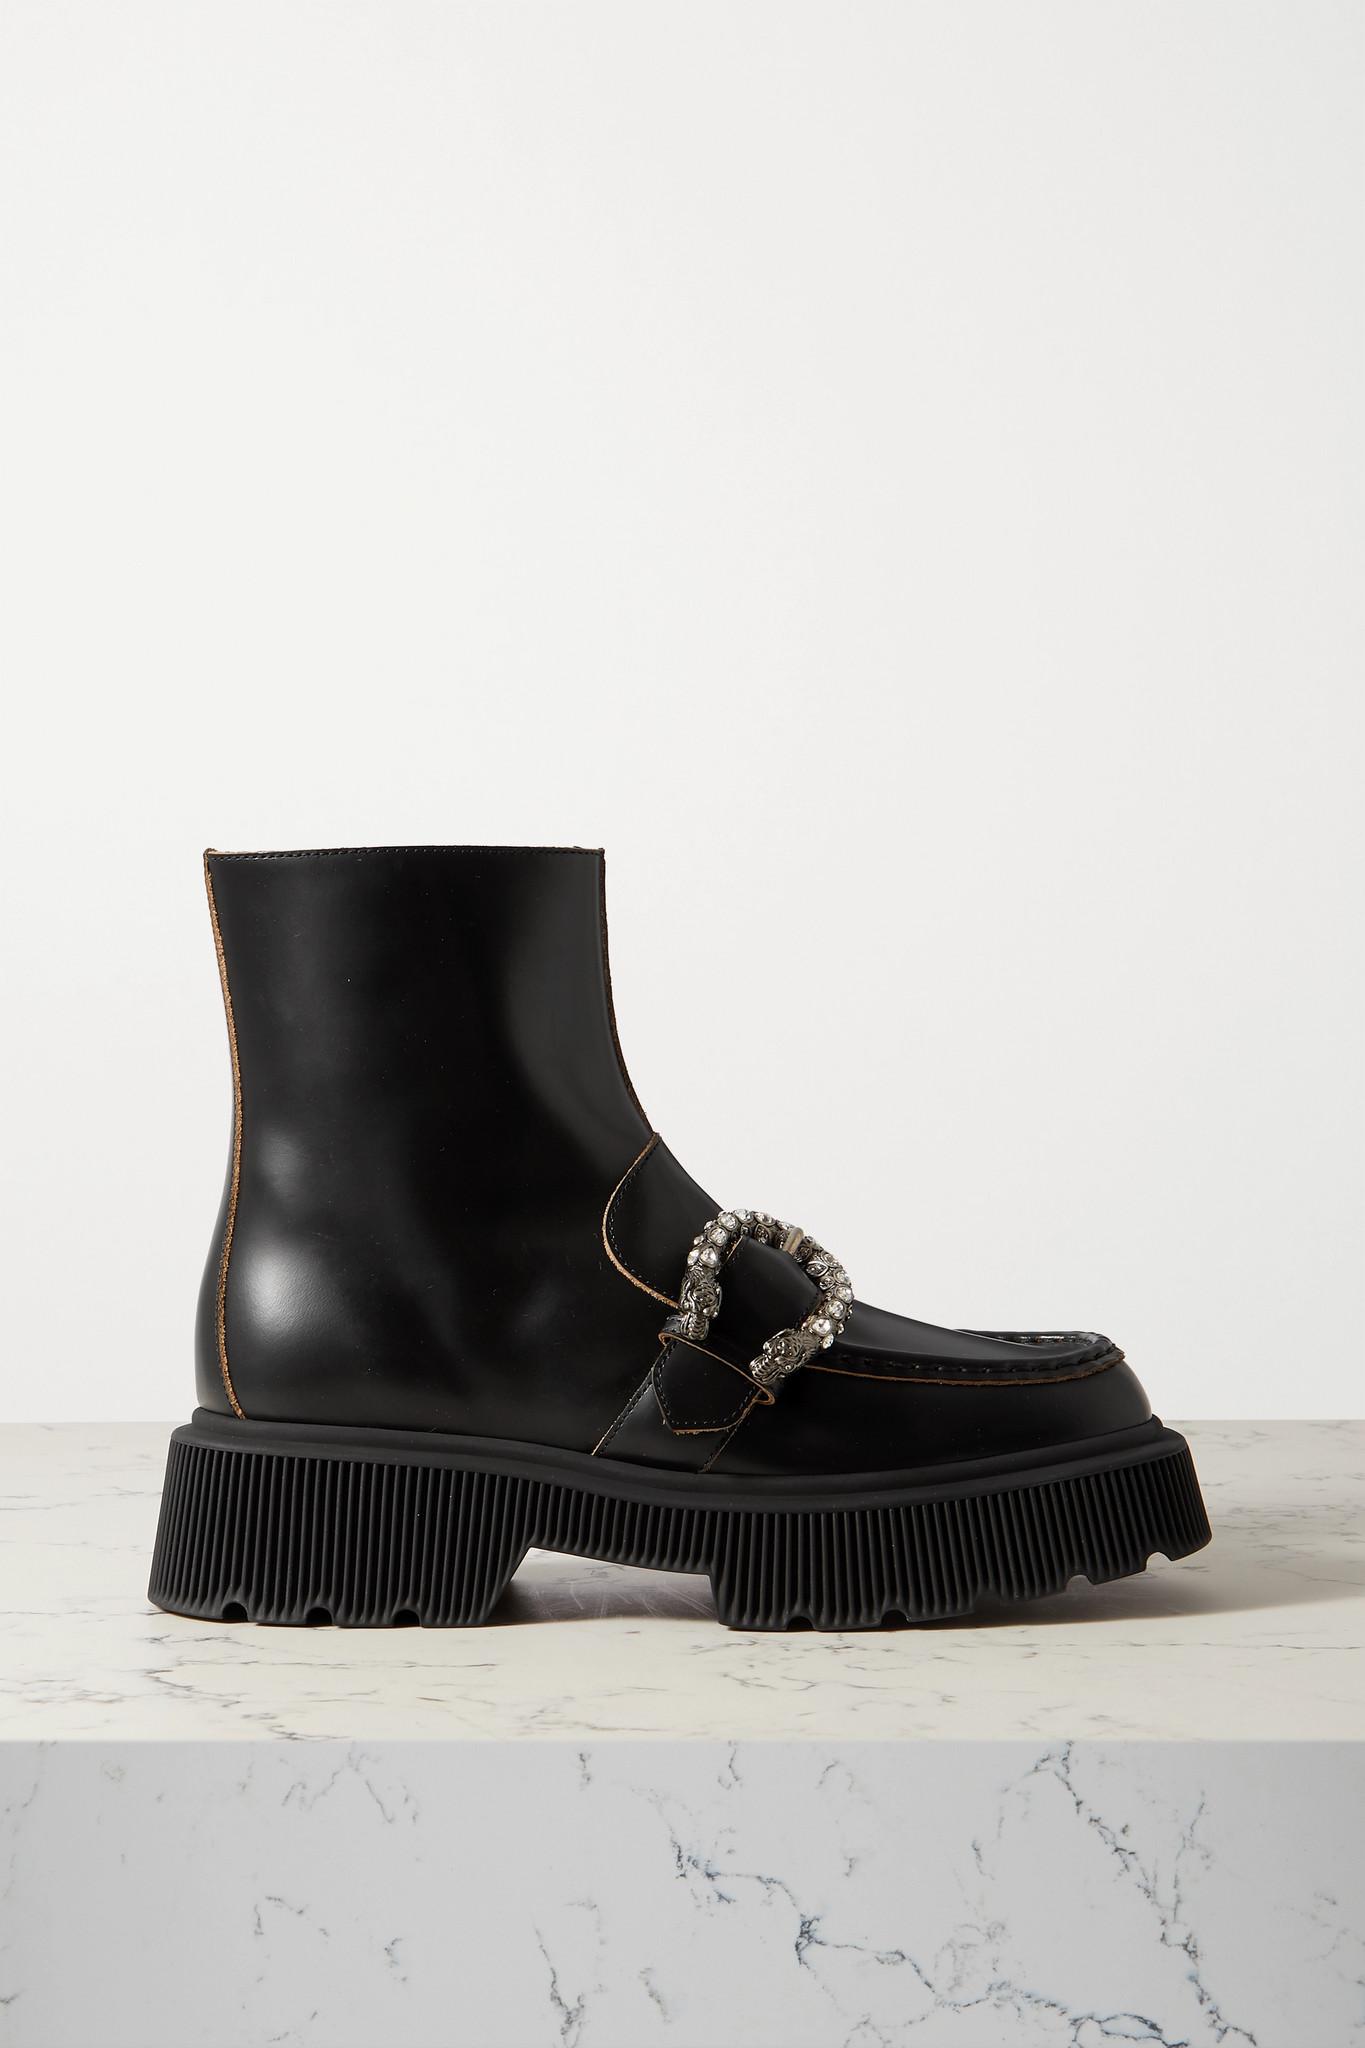 GUCCI - Hunder 搭扣皮革防水台踝靴 - 黑色 - IT36